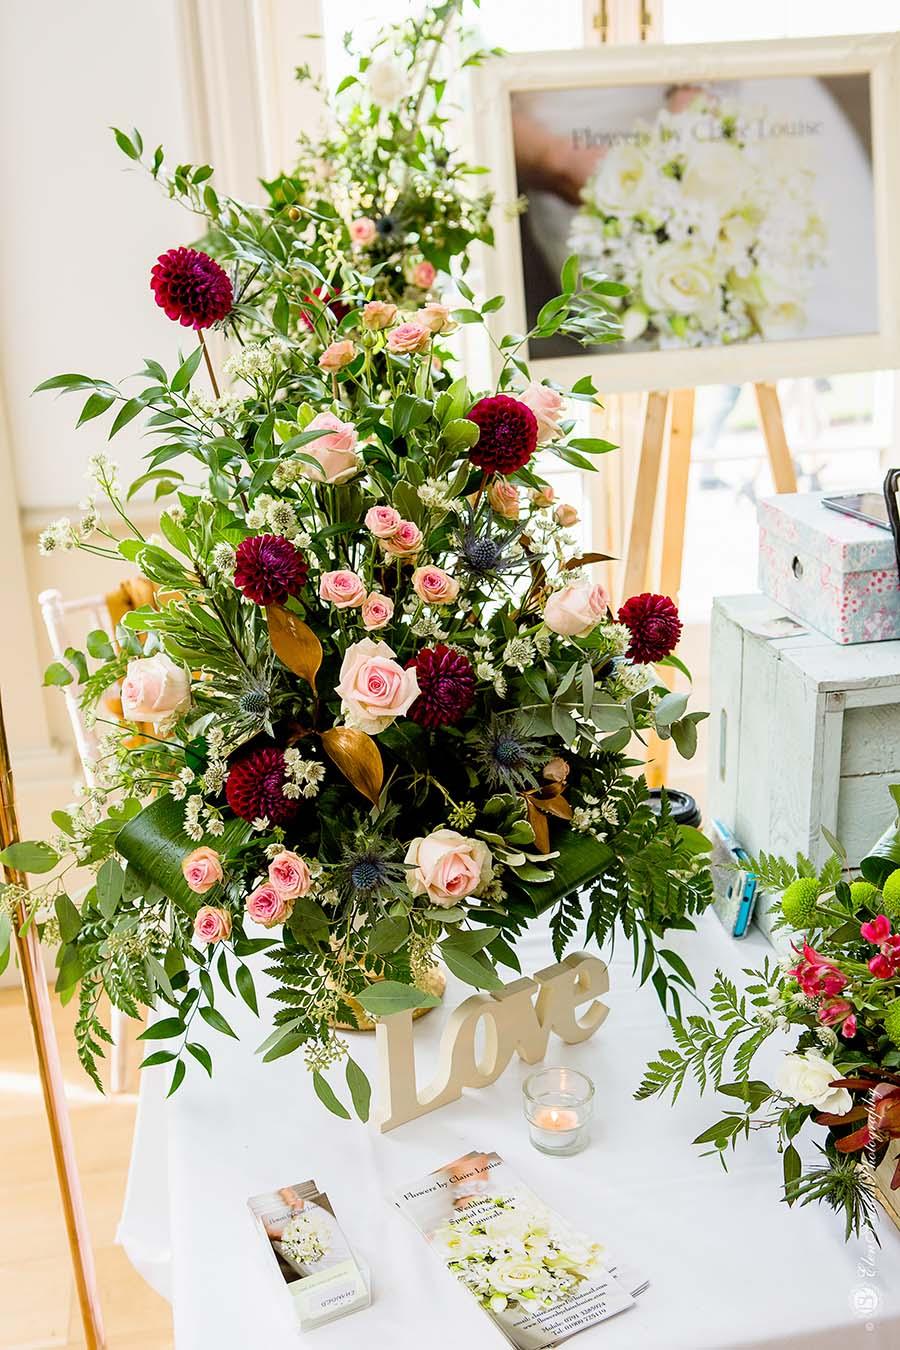 Hodsock-priory-wedding-fair-Elen-Studio-Photography-017